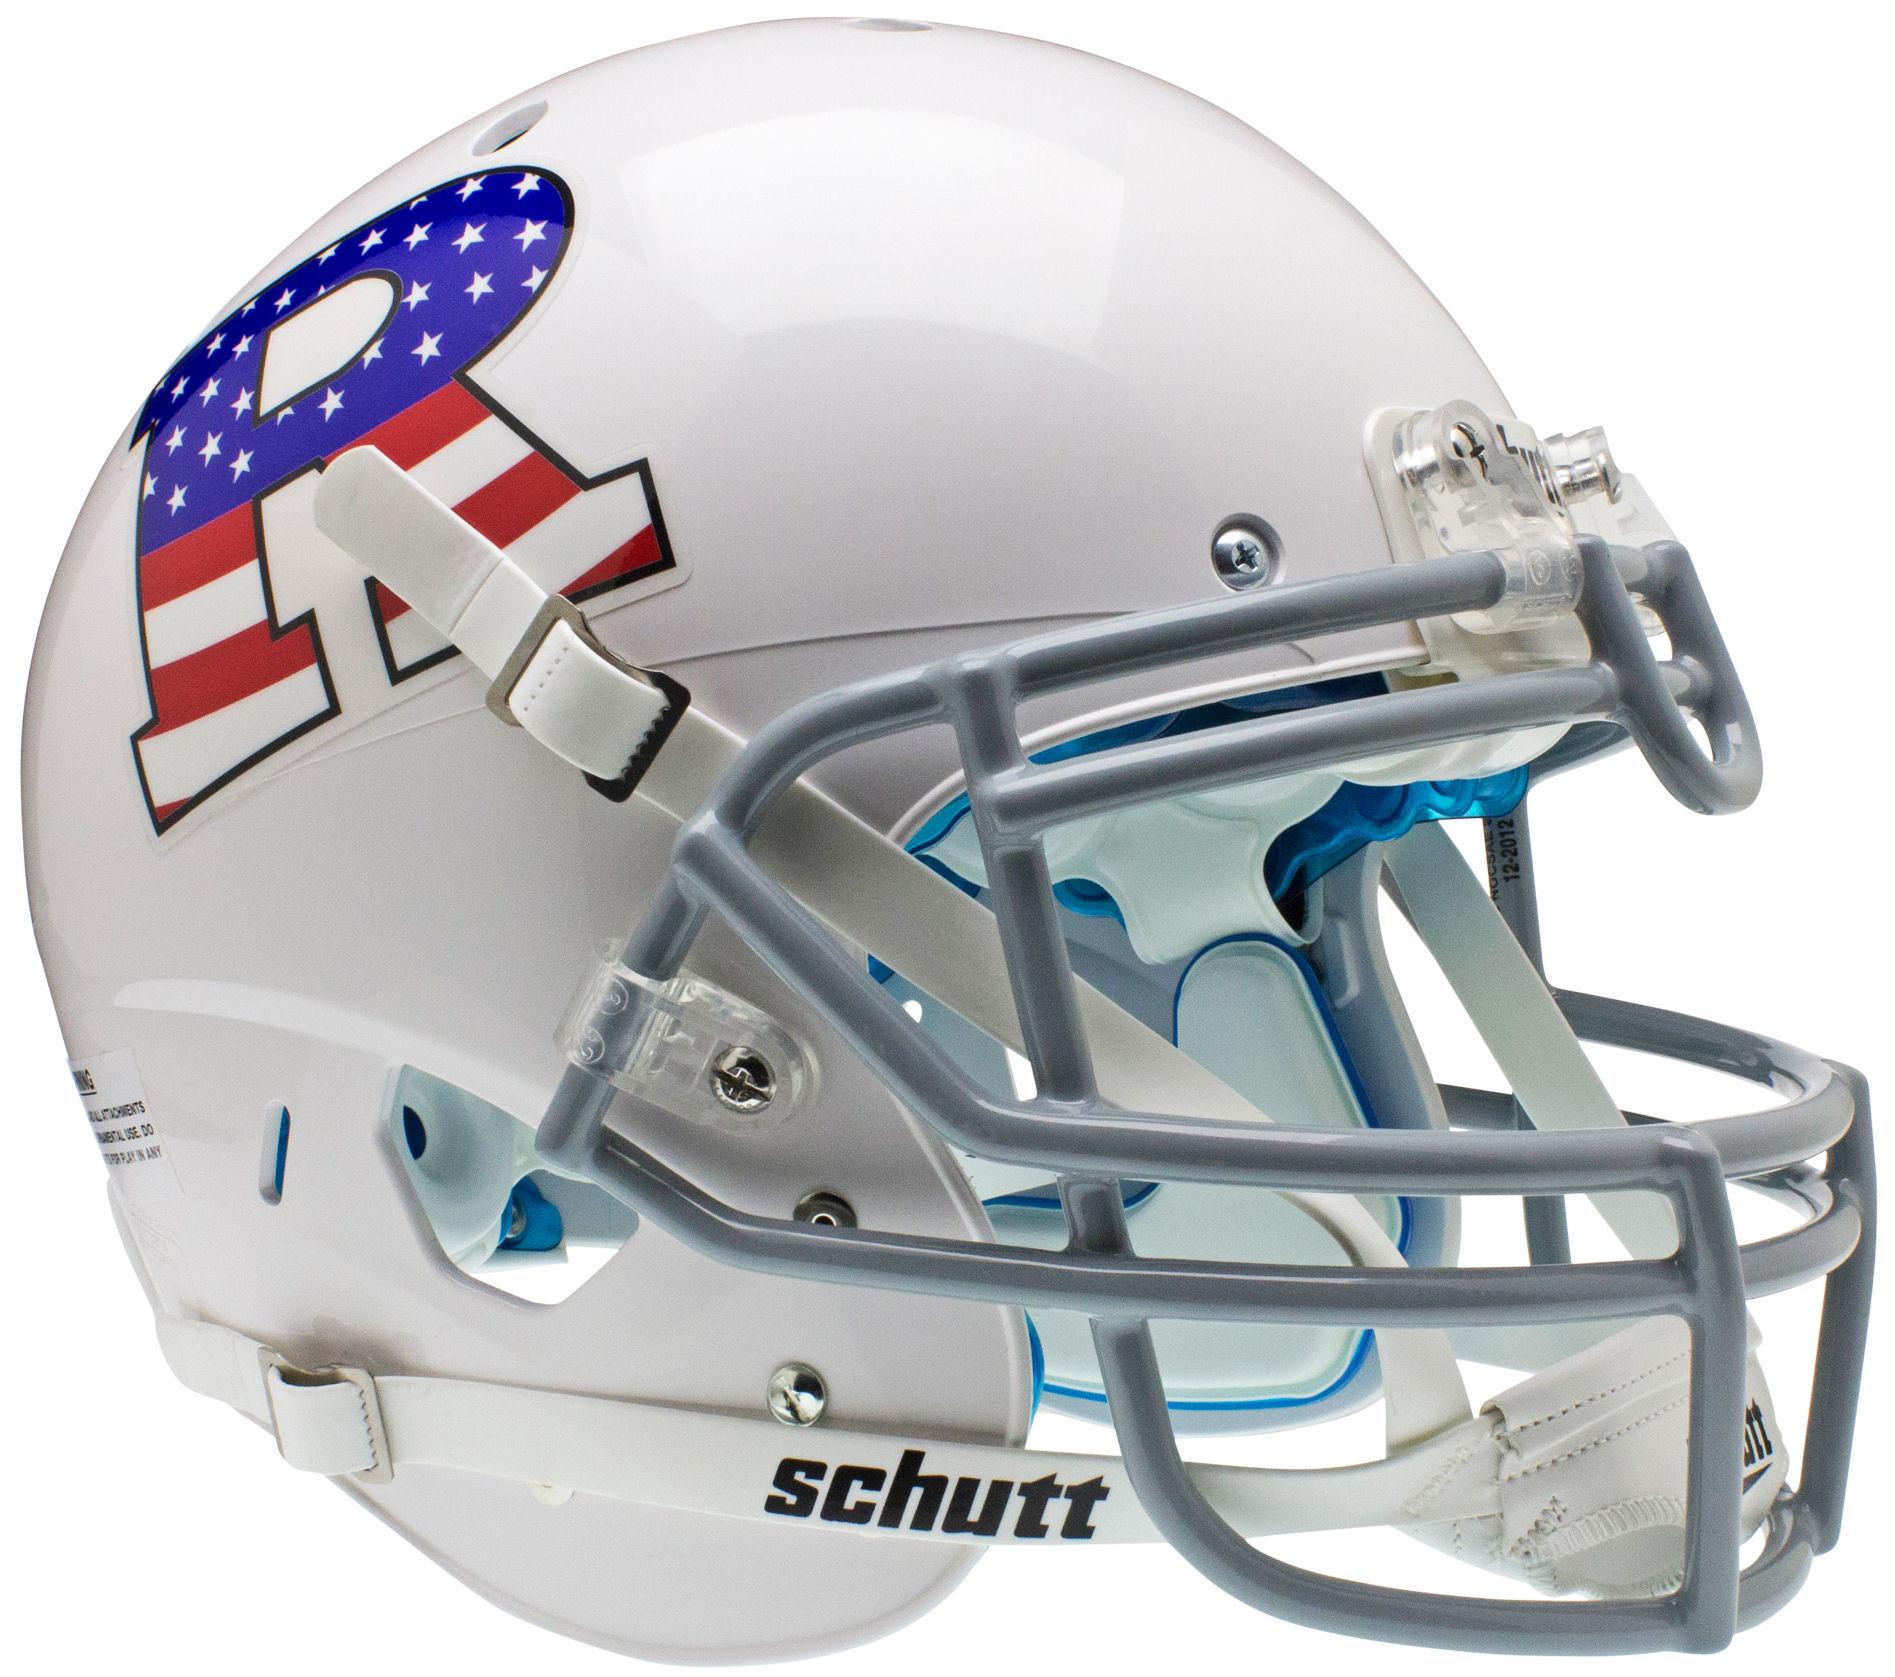 RUTGERS SCARLET KNIGHTS NCAA Schutt Authentic MINI Football Helmet CHROME//RED